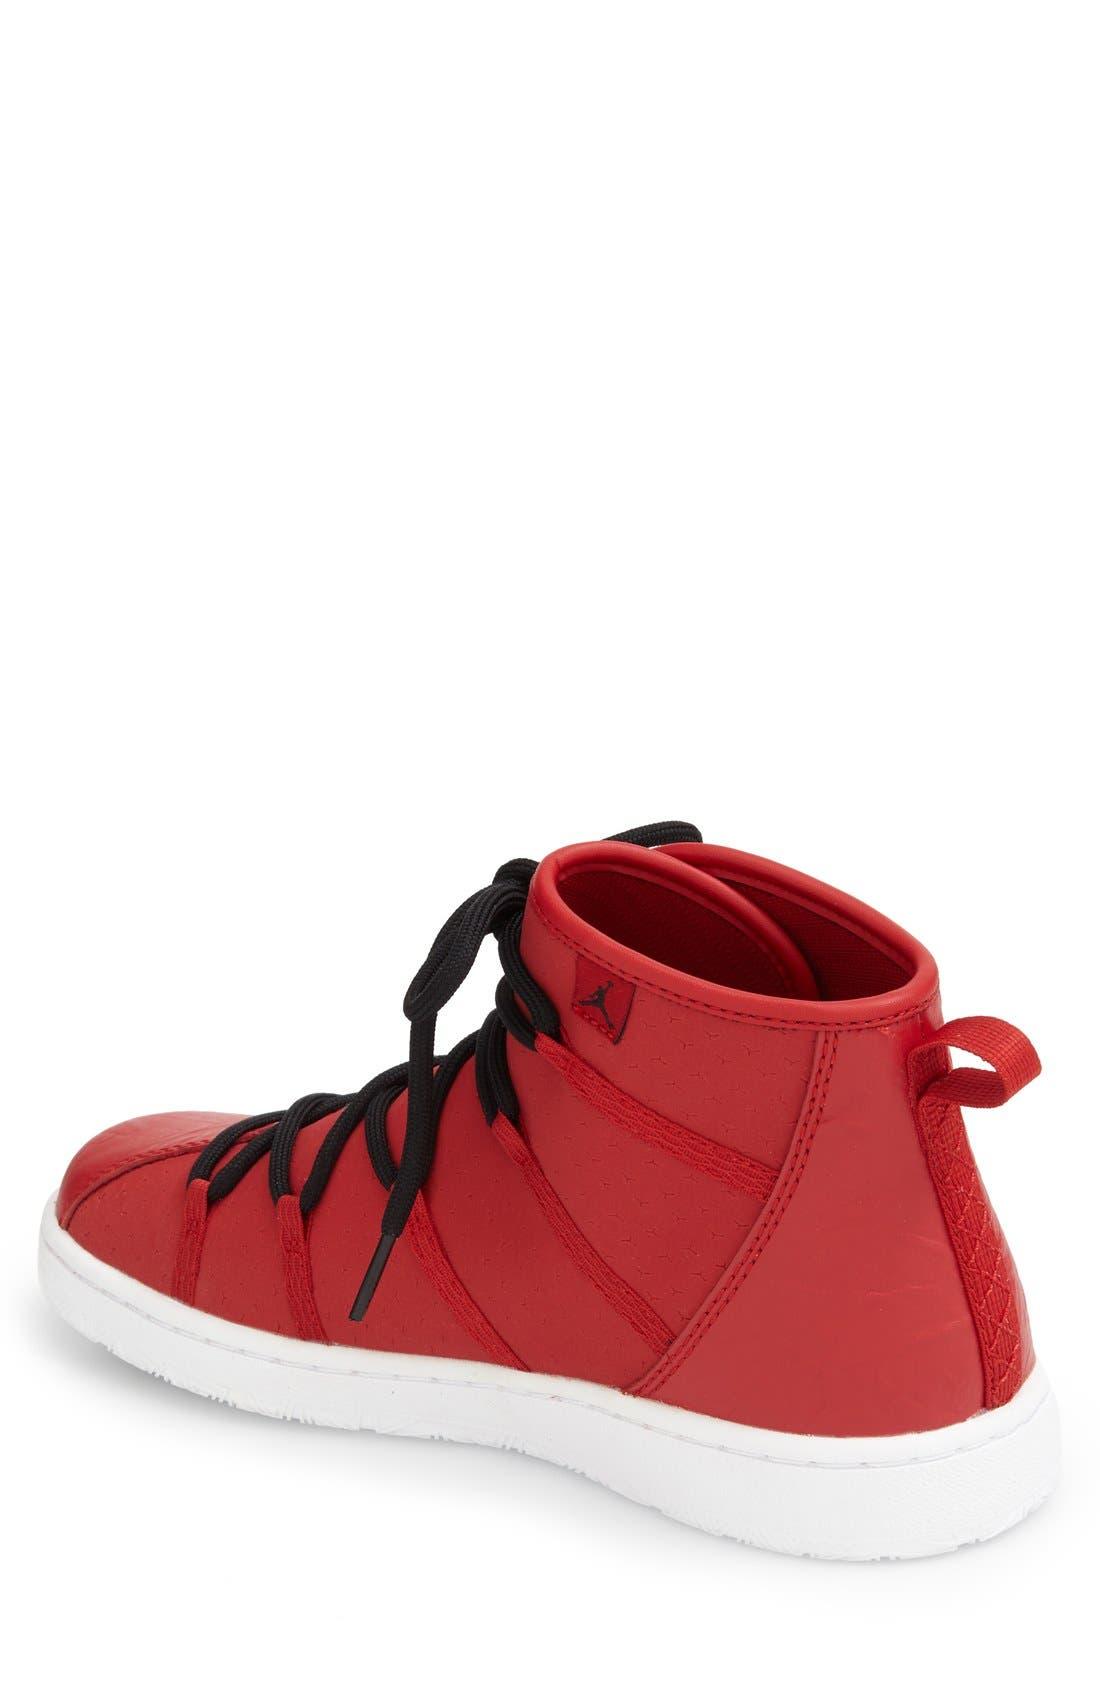 Alternate Image 2  - Nike' Jordan Galaxy' Sneaker (Men)